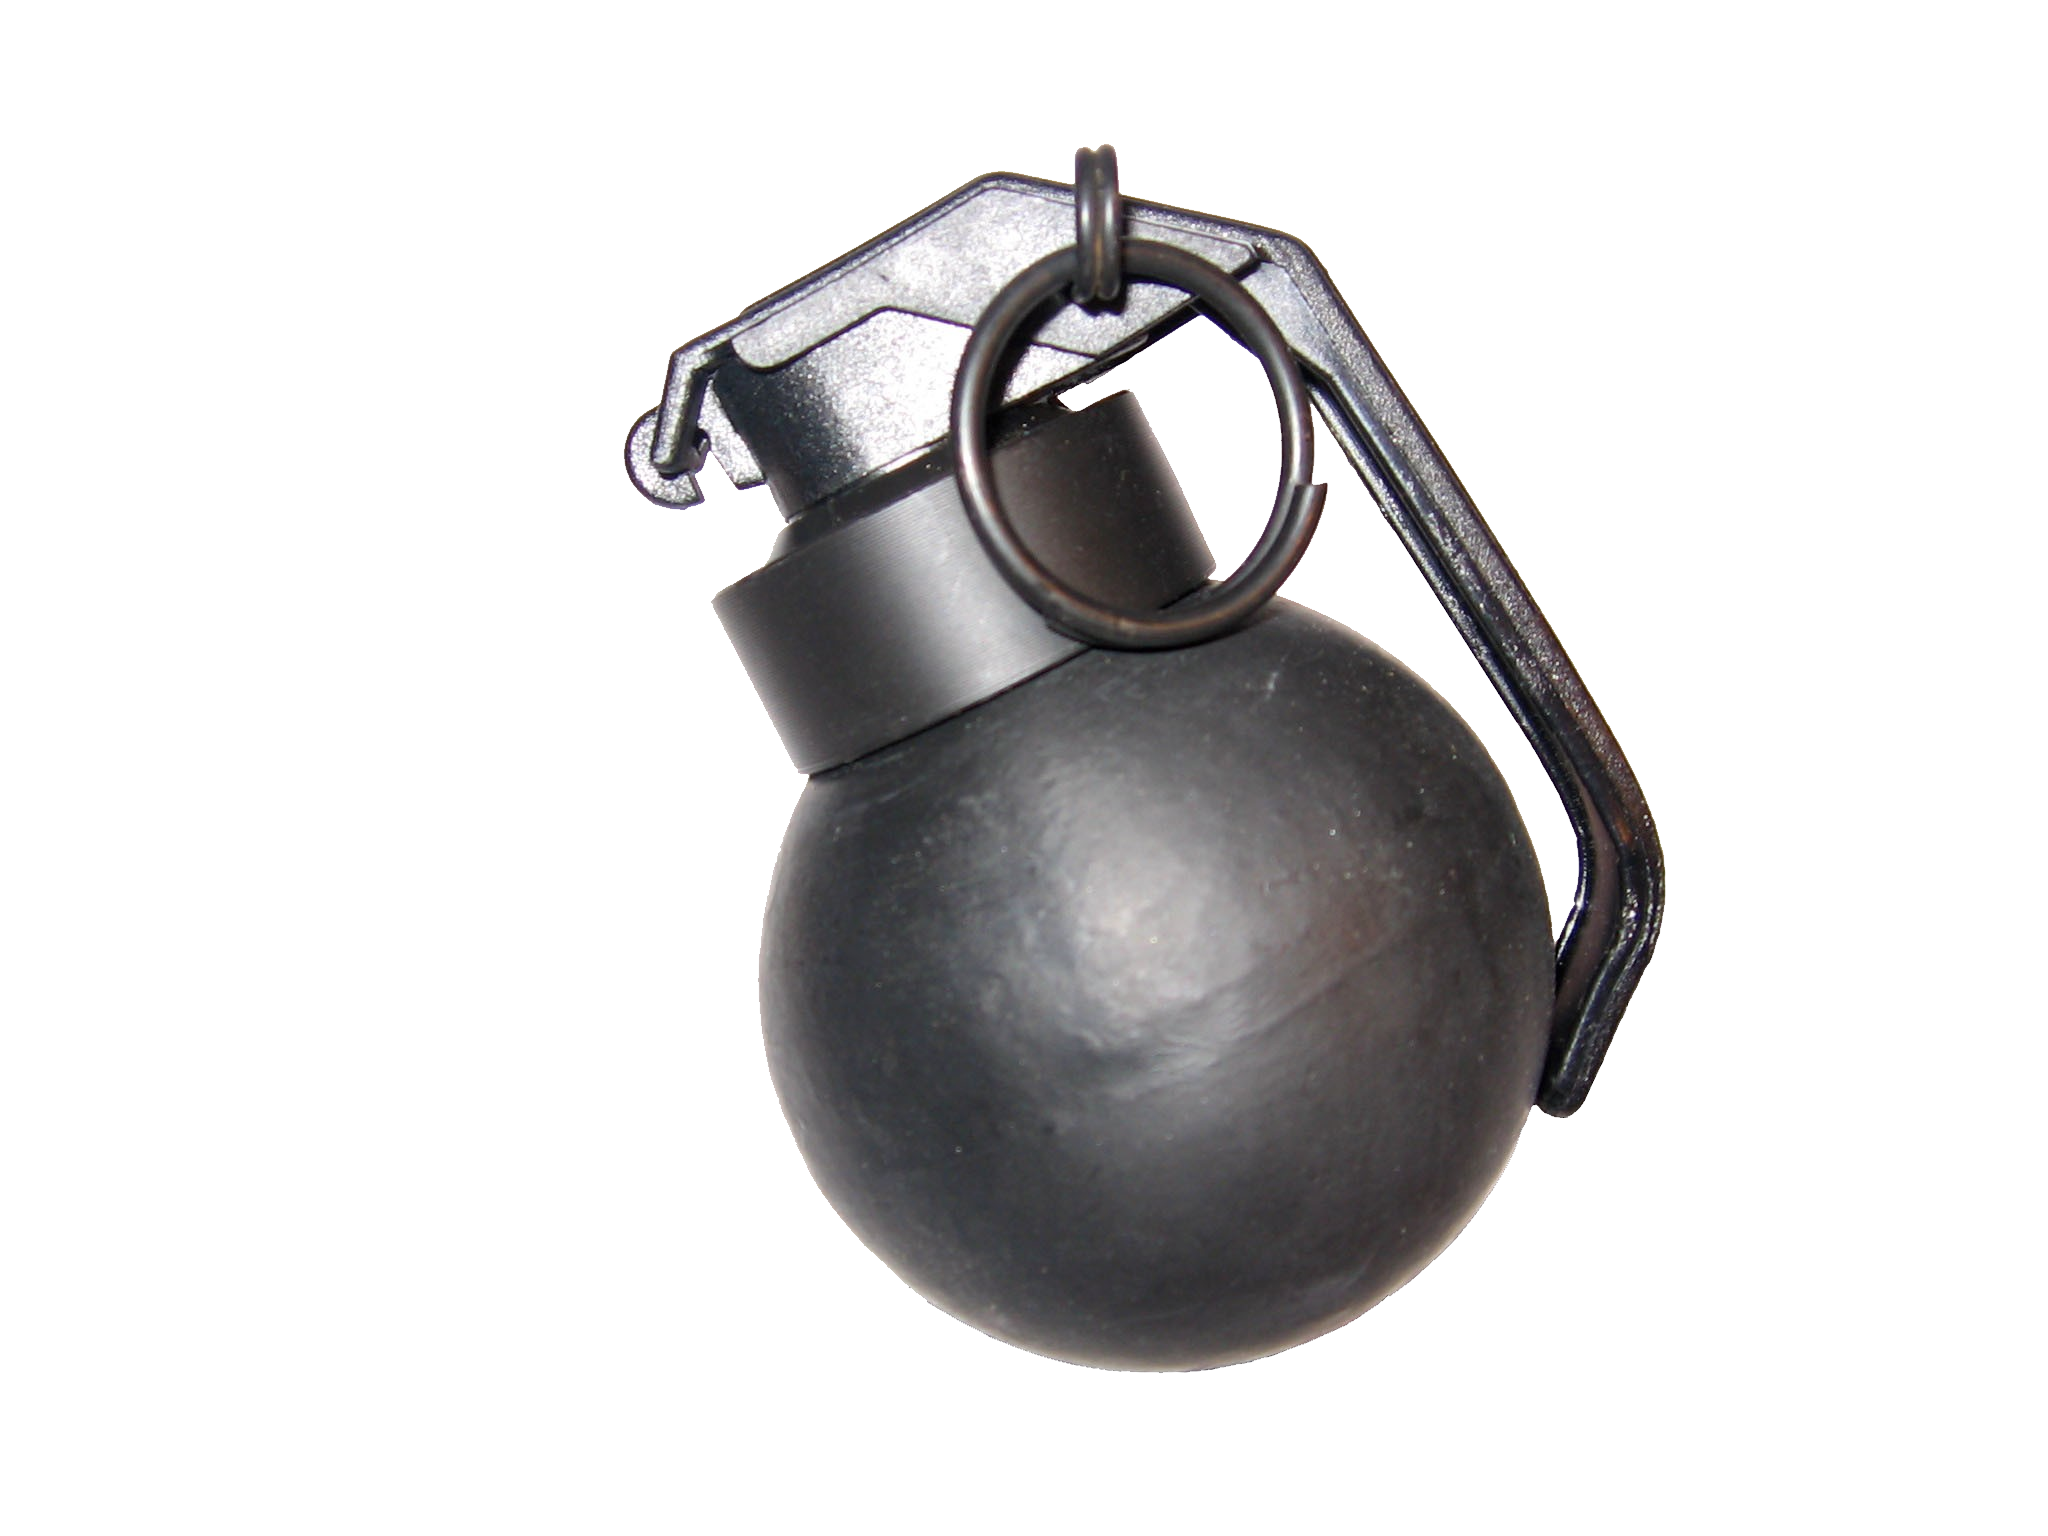 Download Png Image Hand Grenade Png Image Granada Desenho Granada Armas